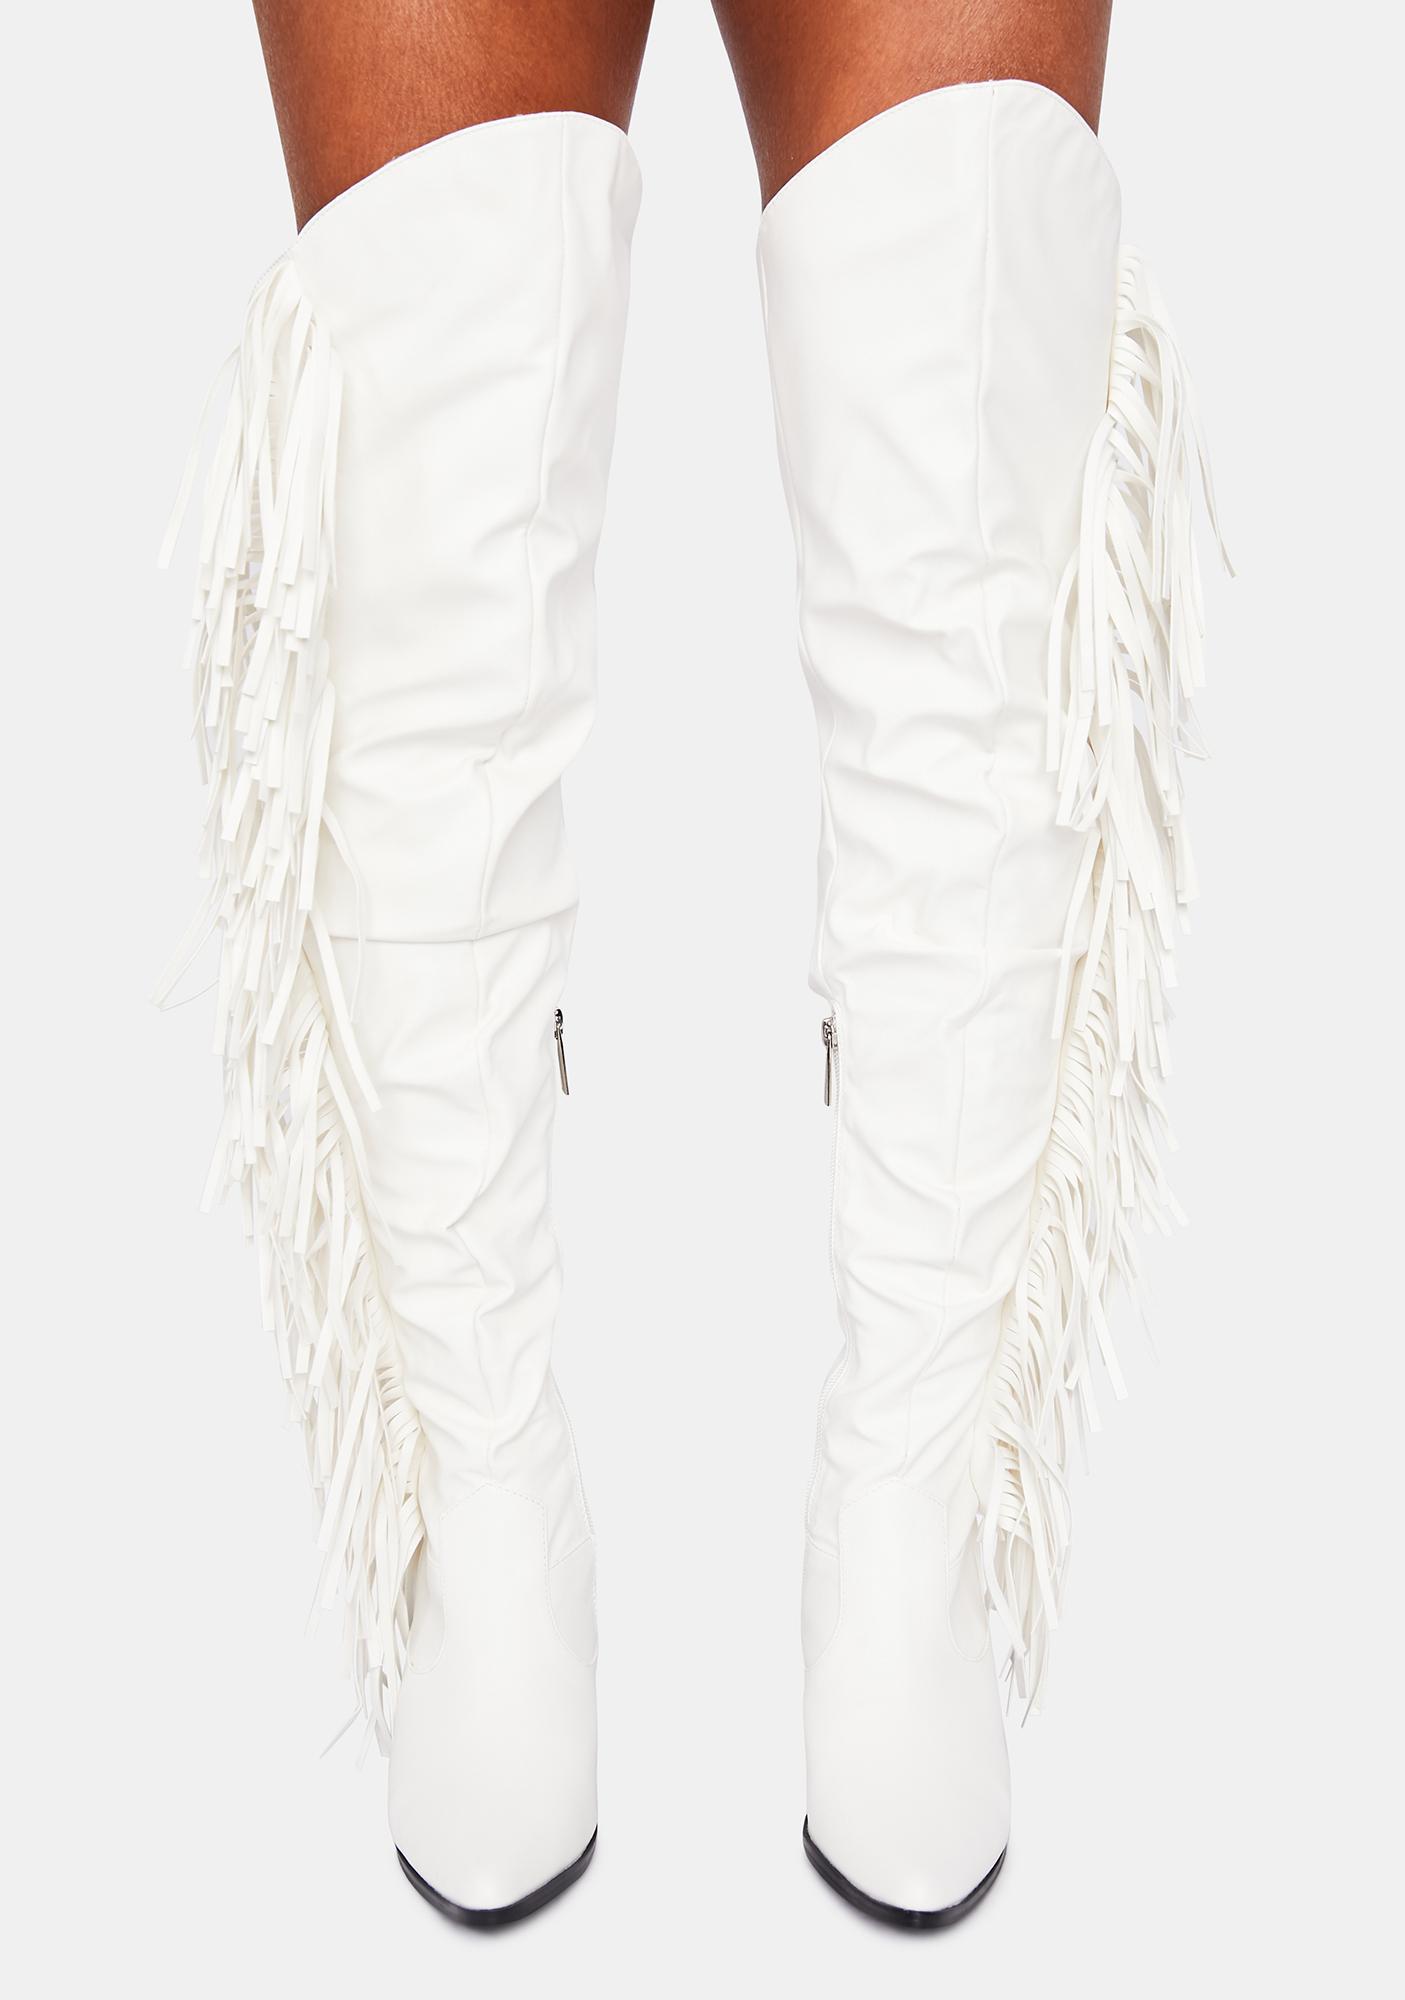 Fringe Tall Boots - White | Dolls Kill